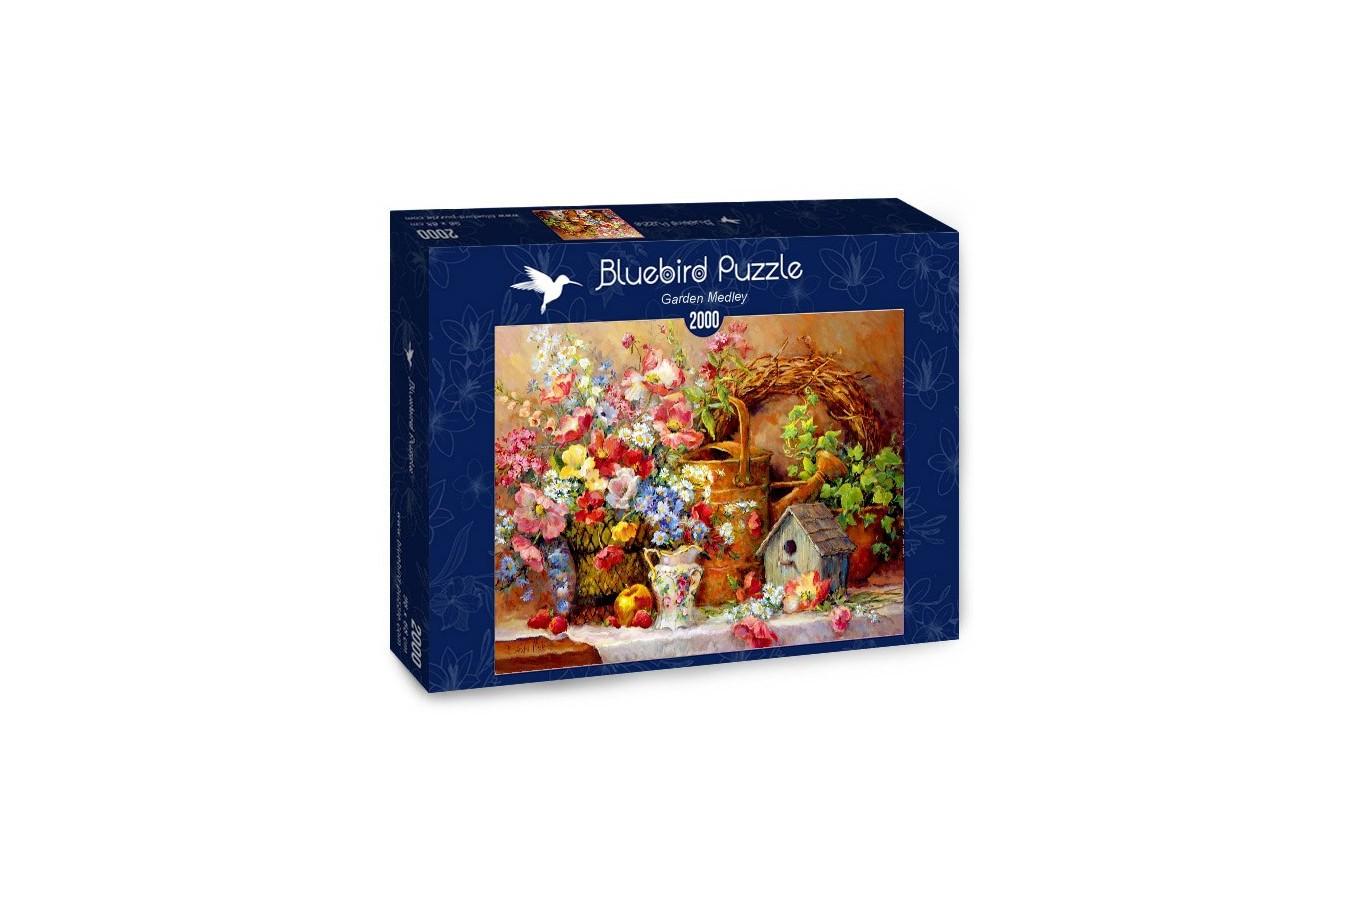 Puzzle Bluebird Puzzle - Garden Medley, 2.000 piese (Bluebird-Puzzle-70218)